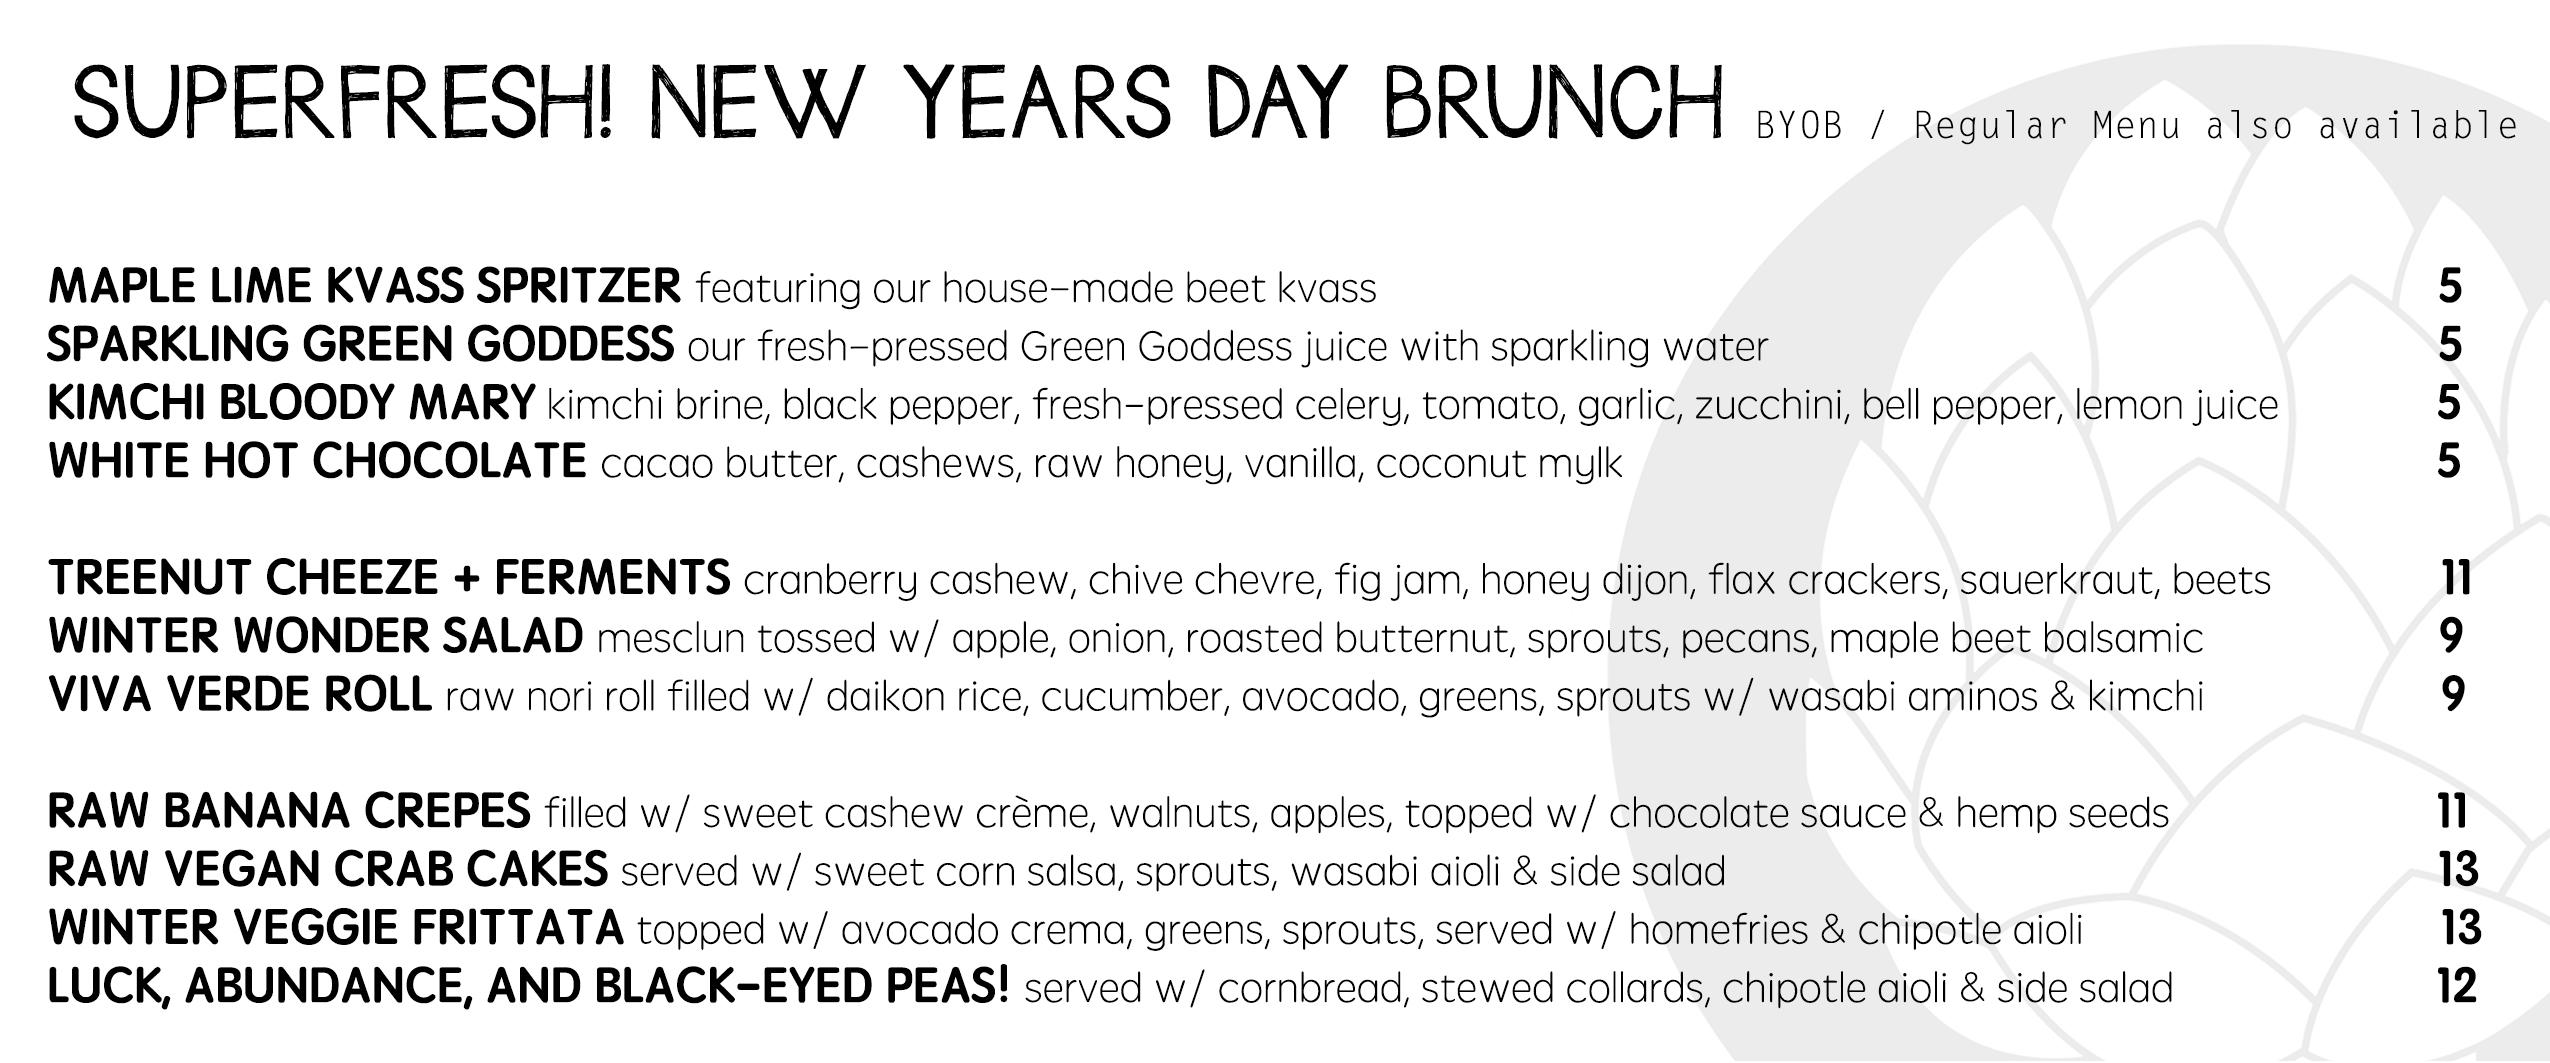 new-years-brunch-menu-2017